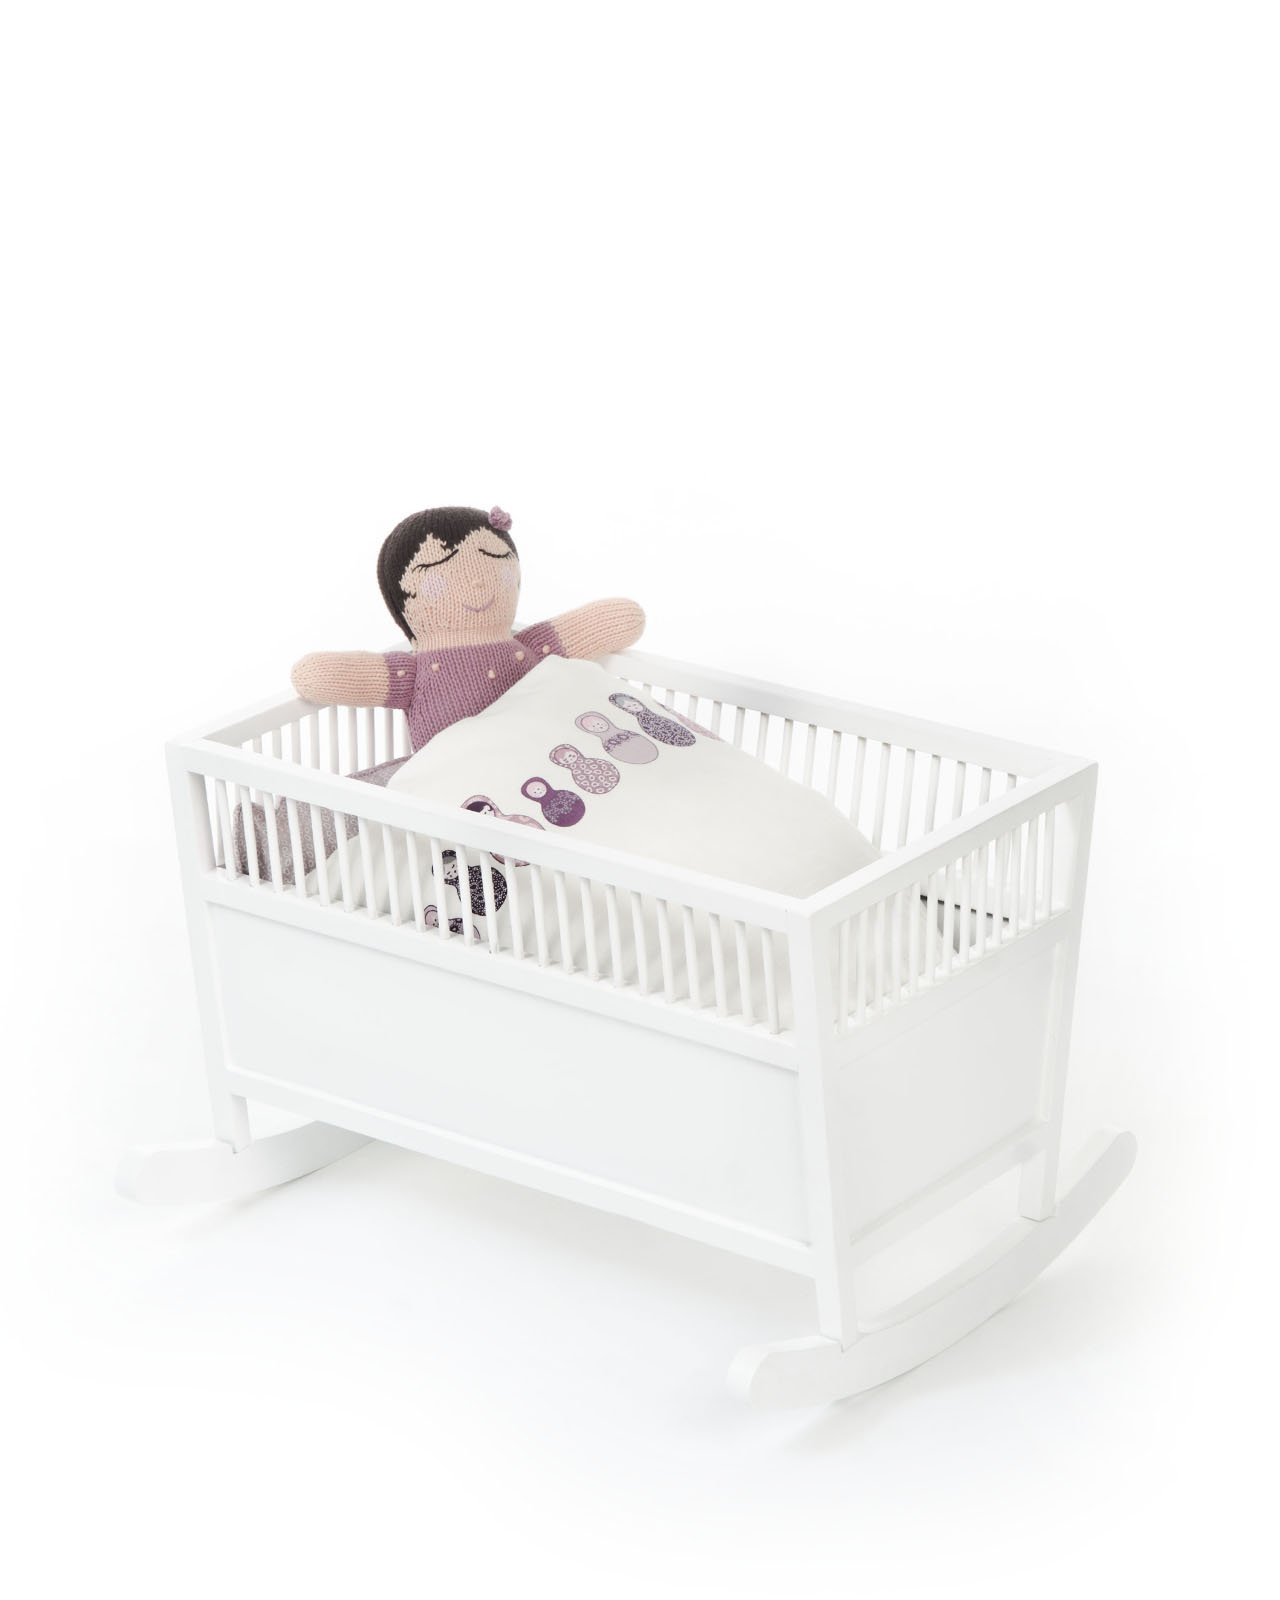 Smallstuff - Cradle, Rosaline - White (51002-02)